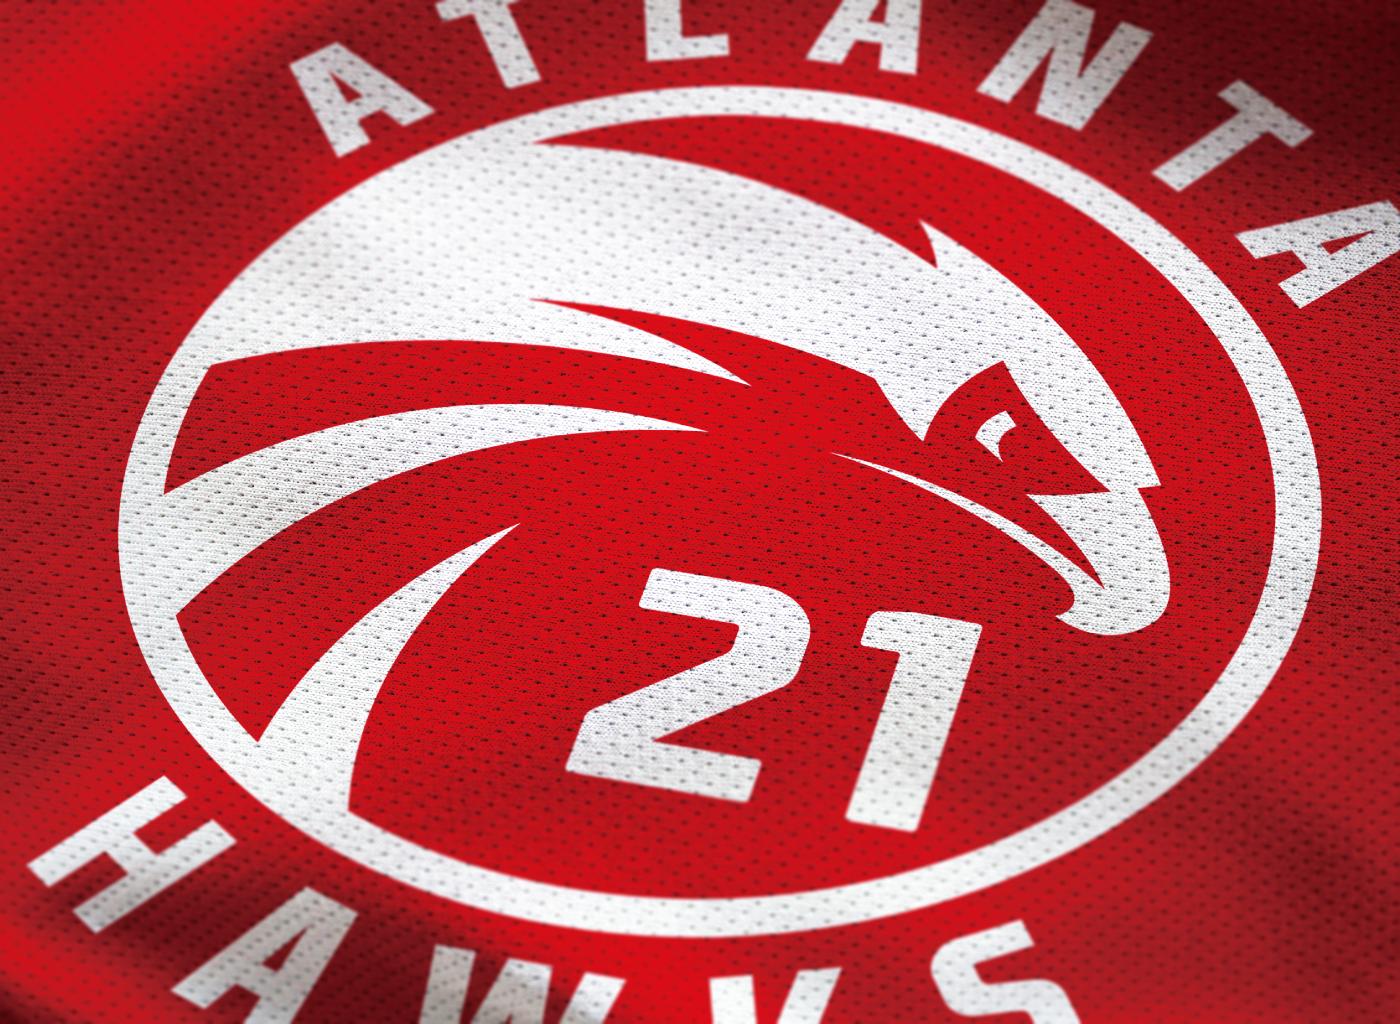 Atlanta hawks logo concept on behance thank you buycottarizona